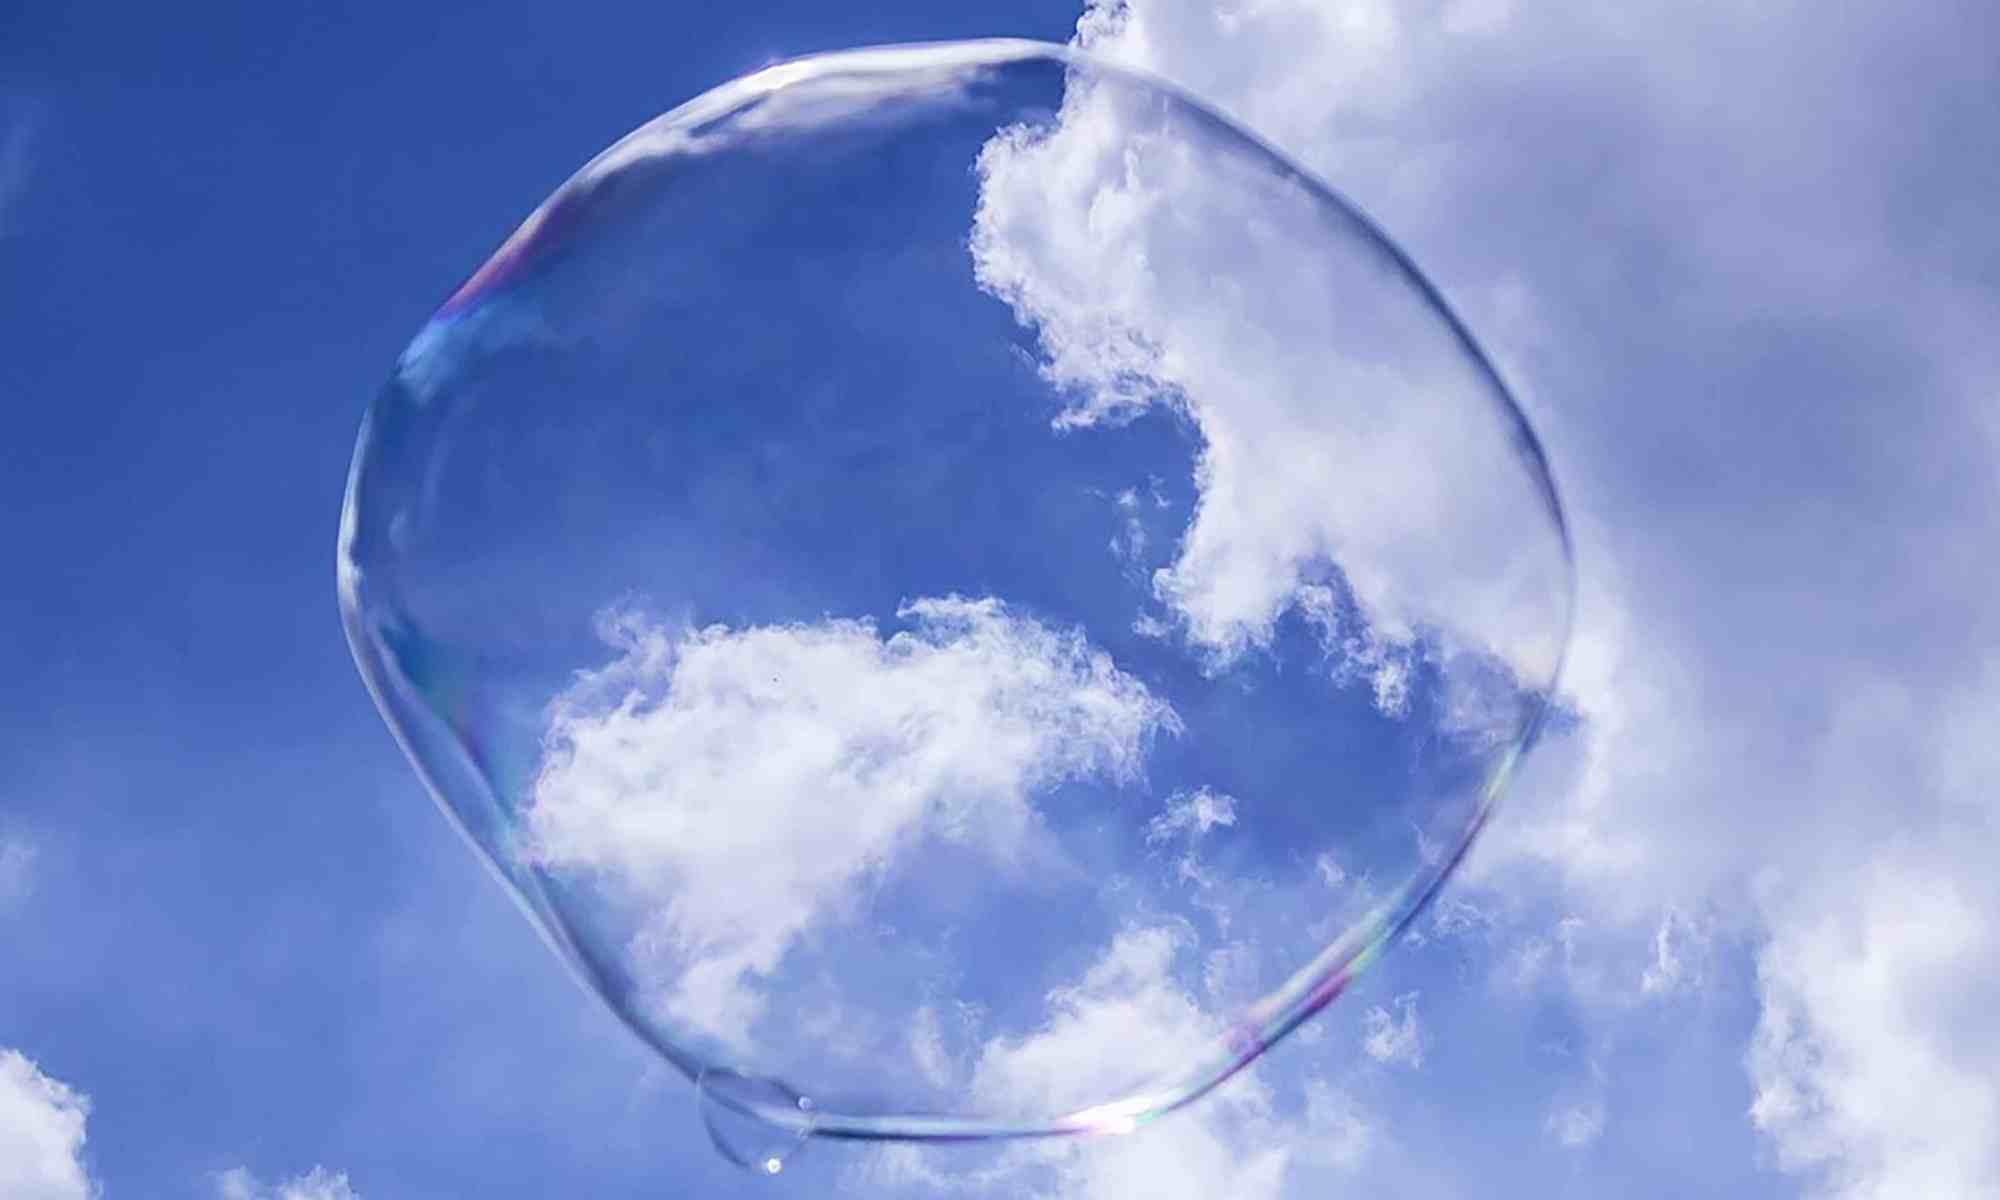 Soap bubble rising into the sky representing clarity